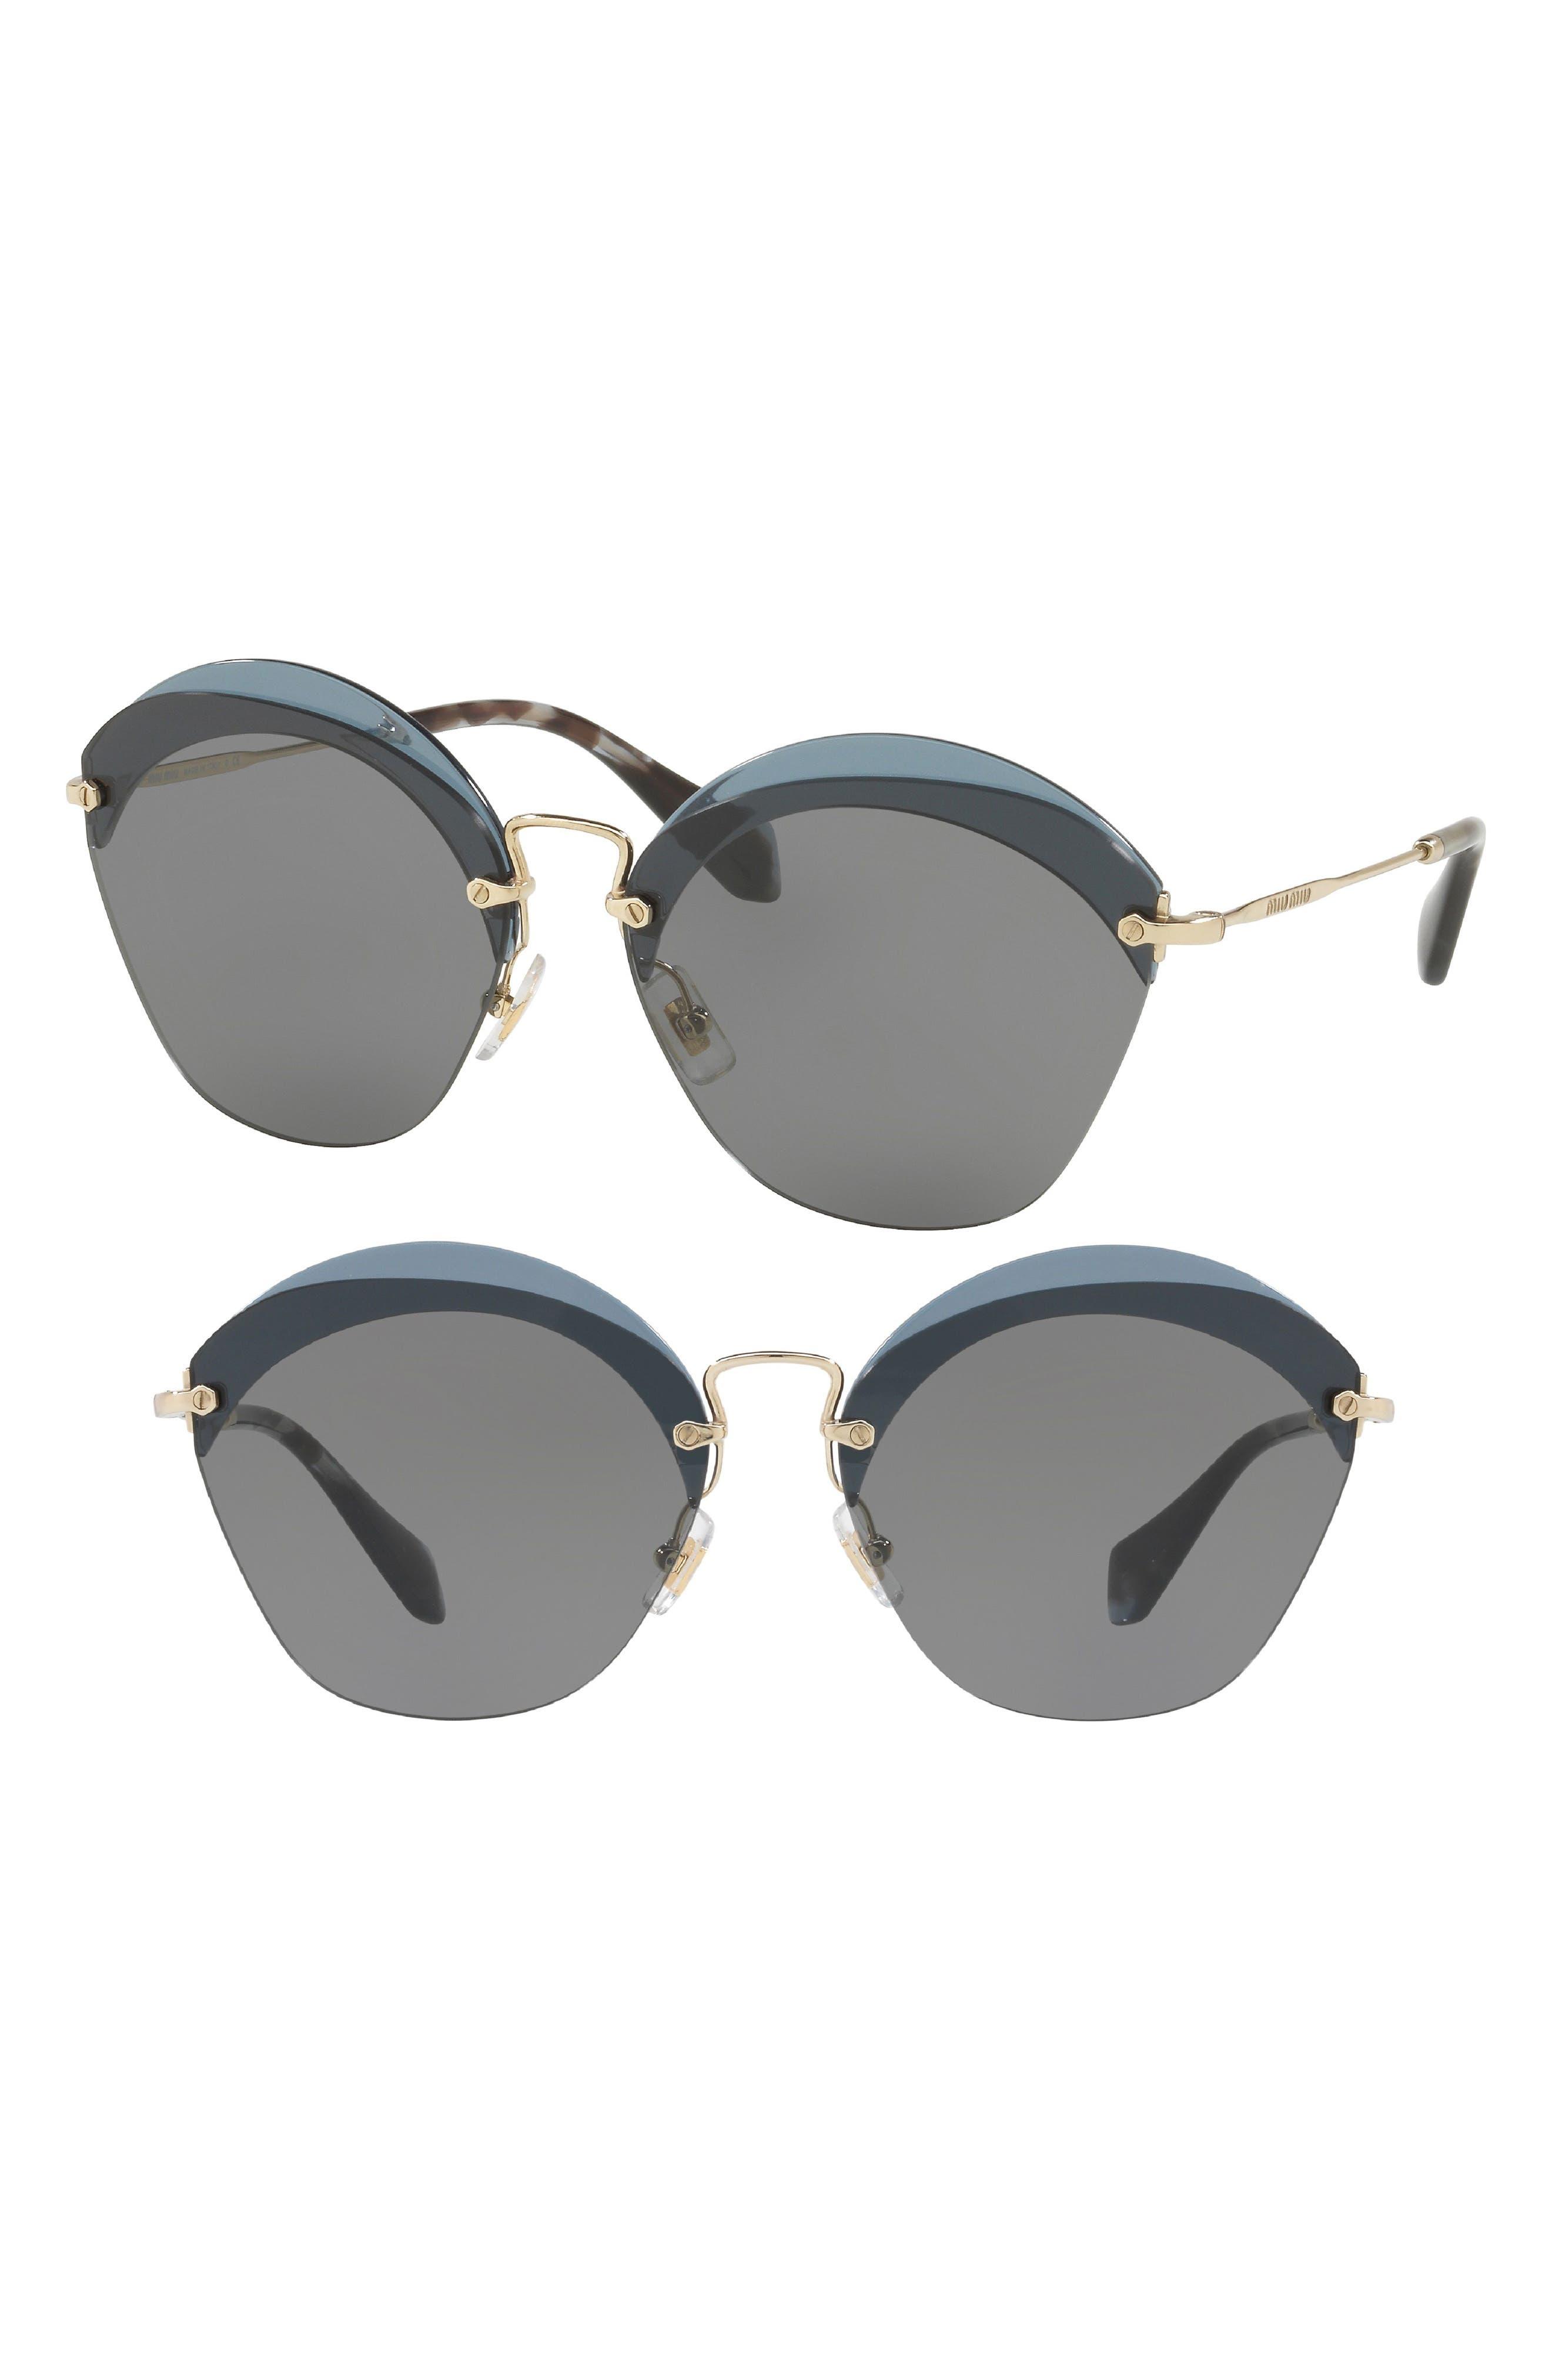 14b4113066 Miu Miu Sunglasses for Women